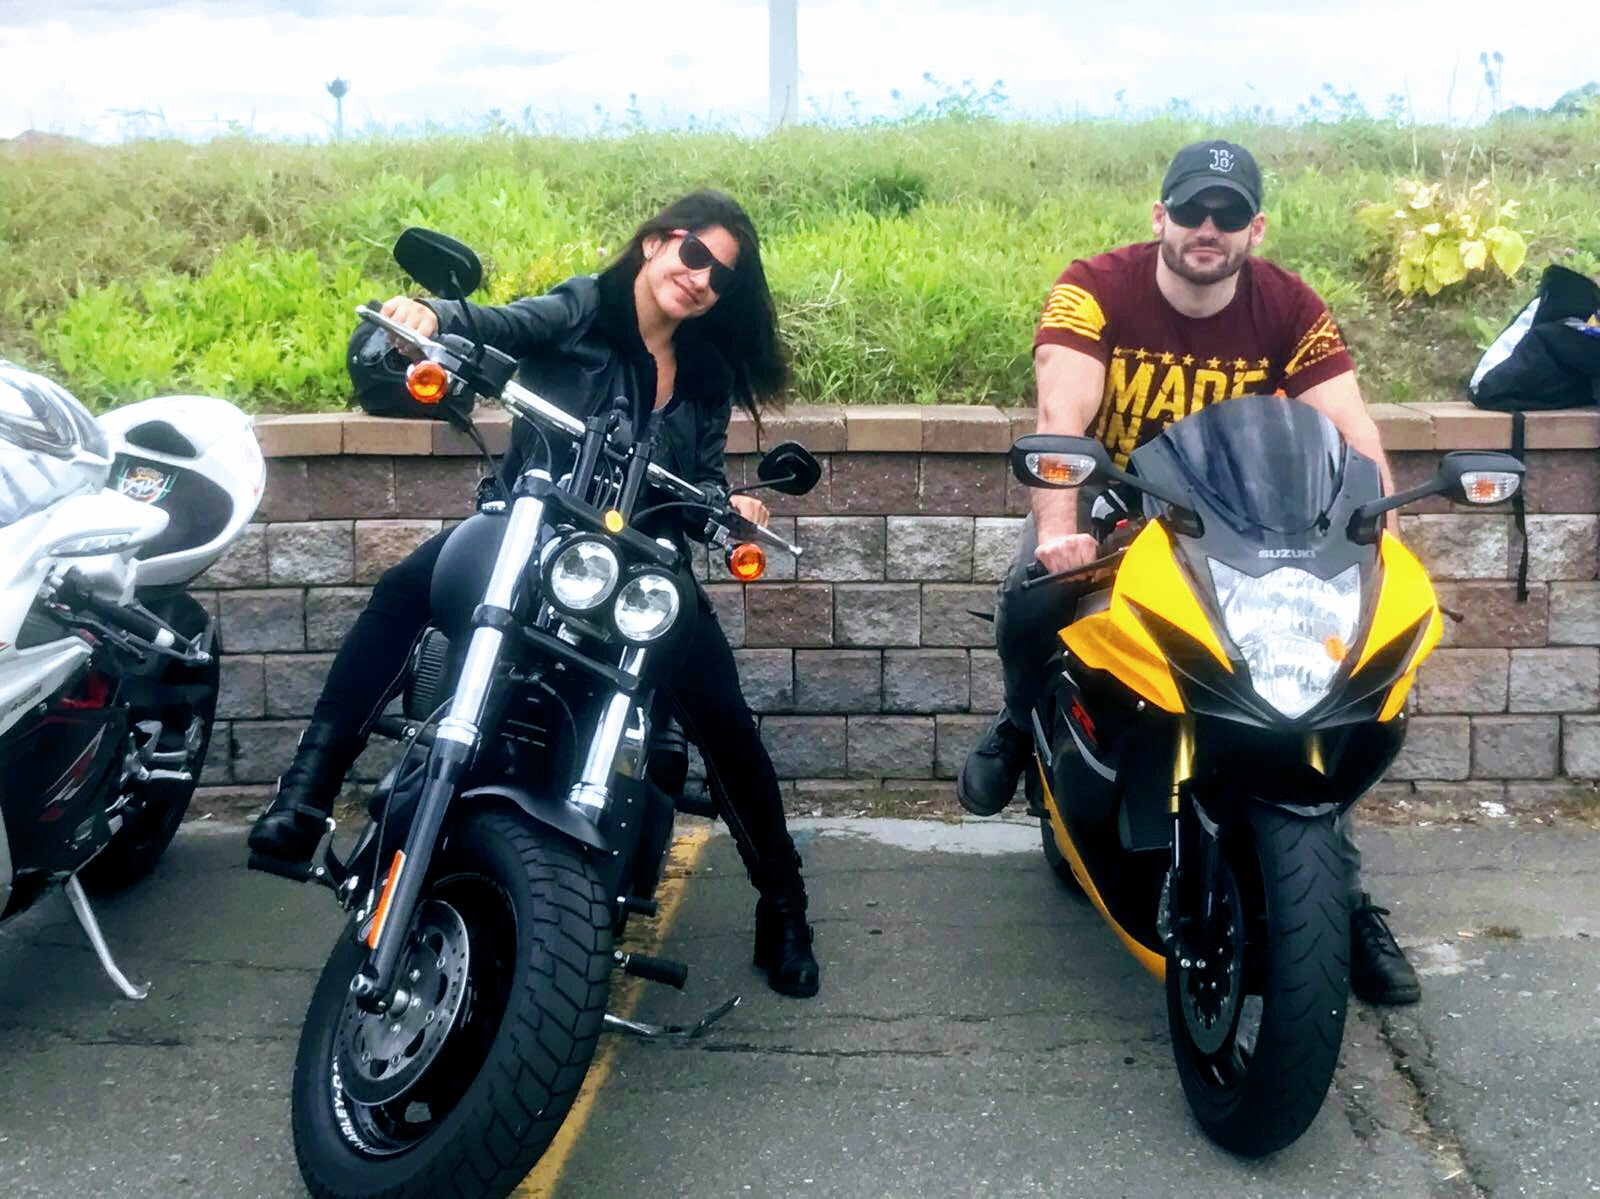 305 Instructor Diana and Partner Derek